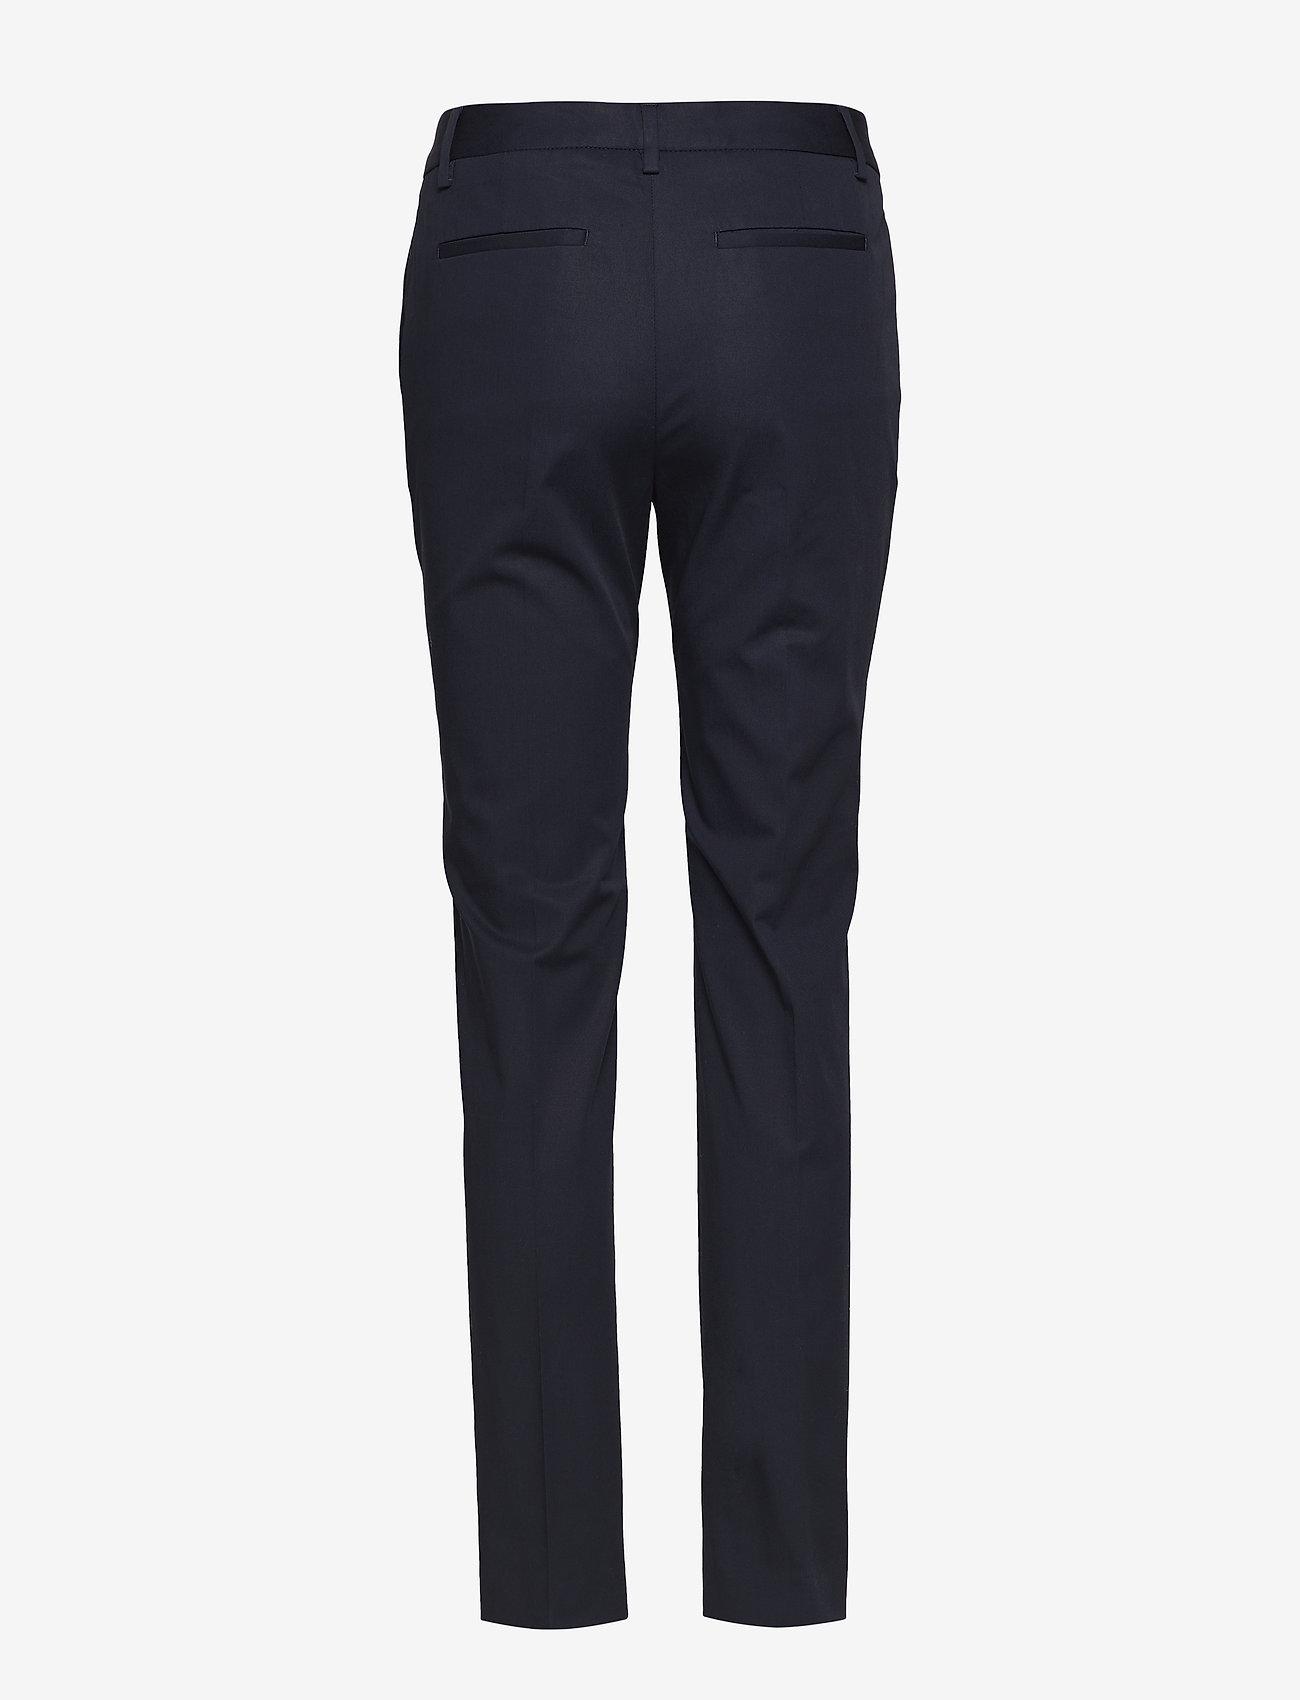 Blake Narrow Leg Pants (Deep Marine Blue) - Lexington Clothing cfGPyJ